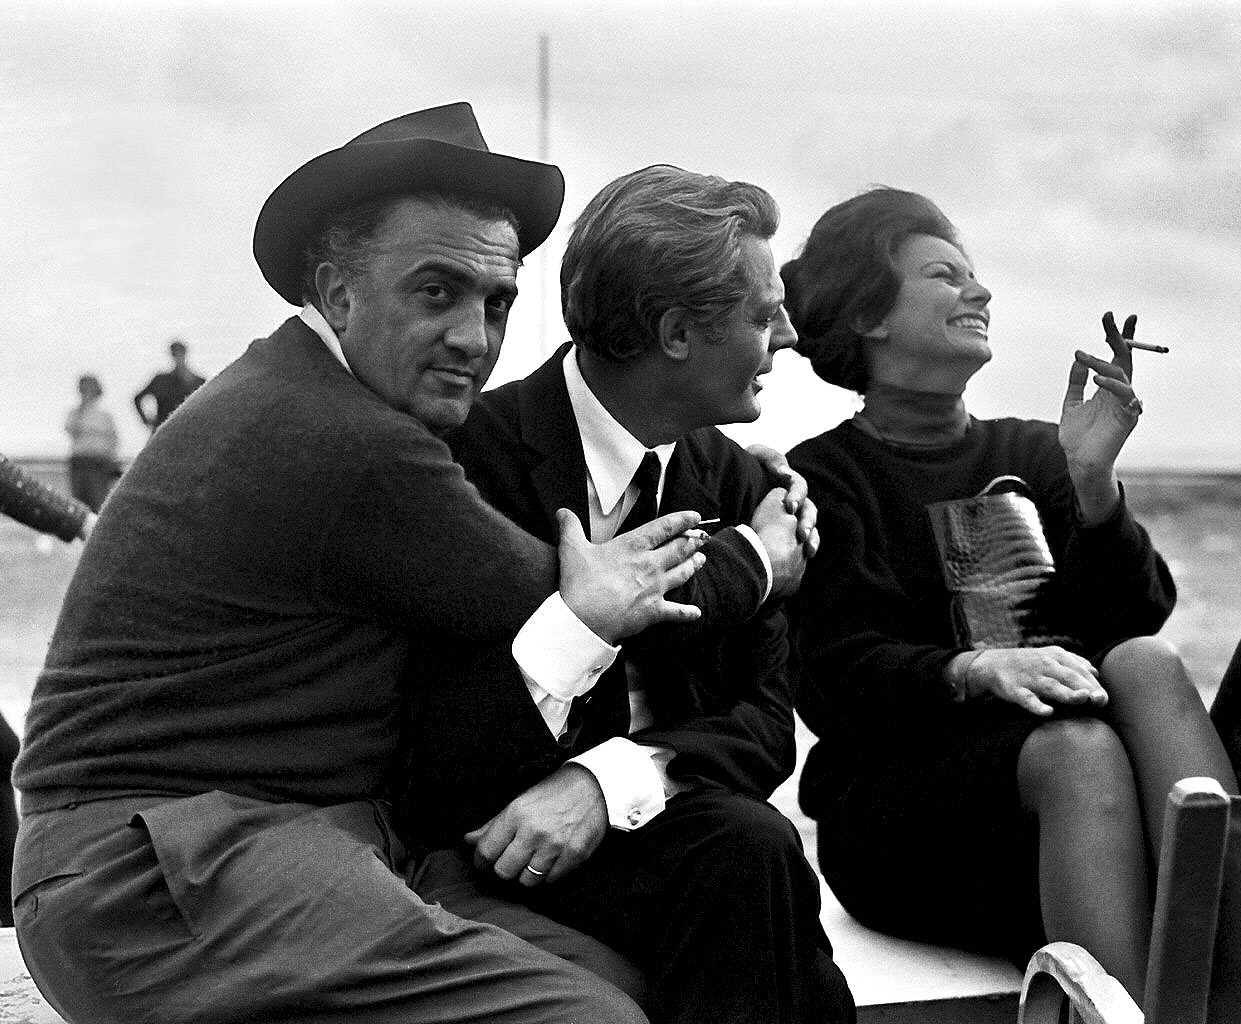 Frederico Fellini, Sophia Loren és Marcello Mastroianni.